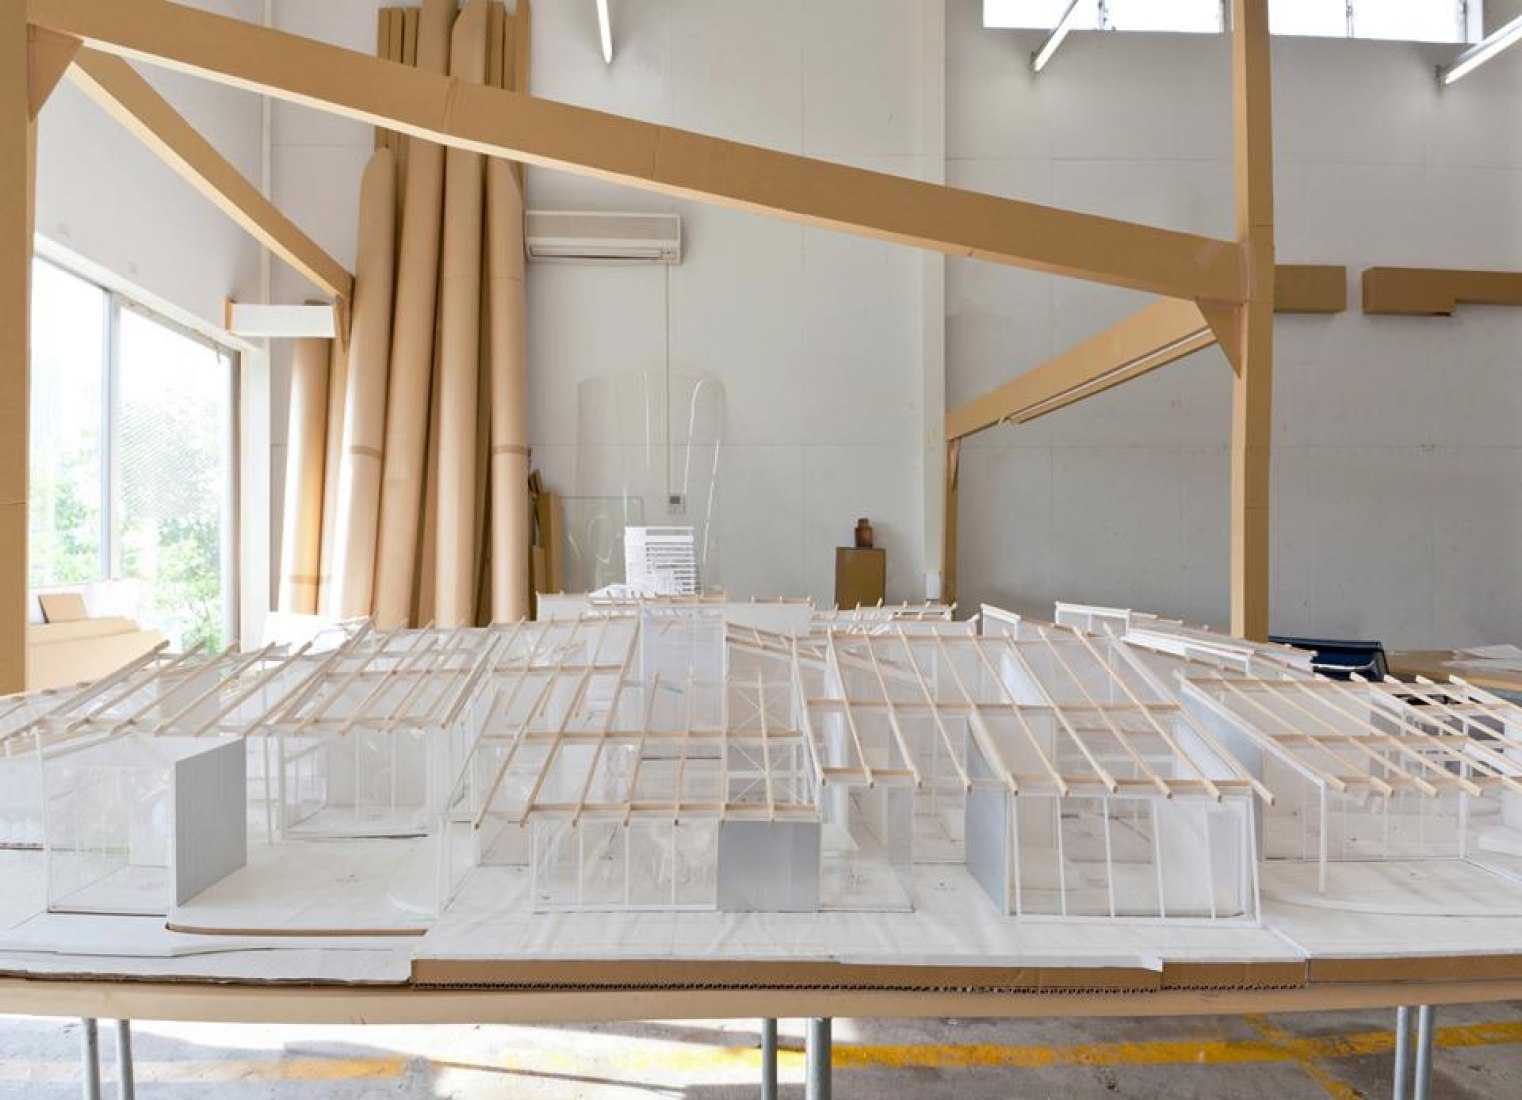 Picture of: Nishinoyama House By Kazuyo Sejima The Strength Of Architecture From 1998